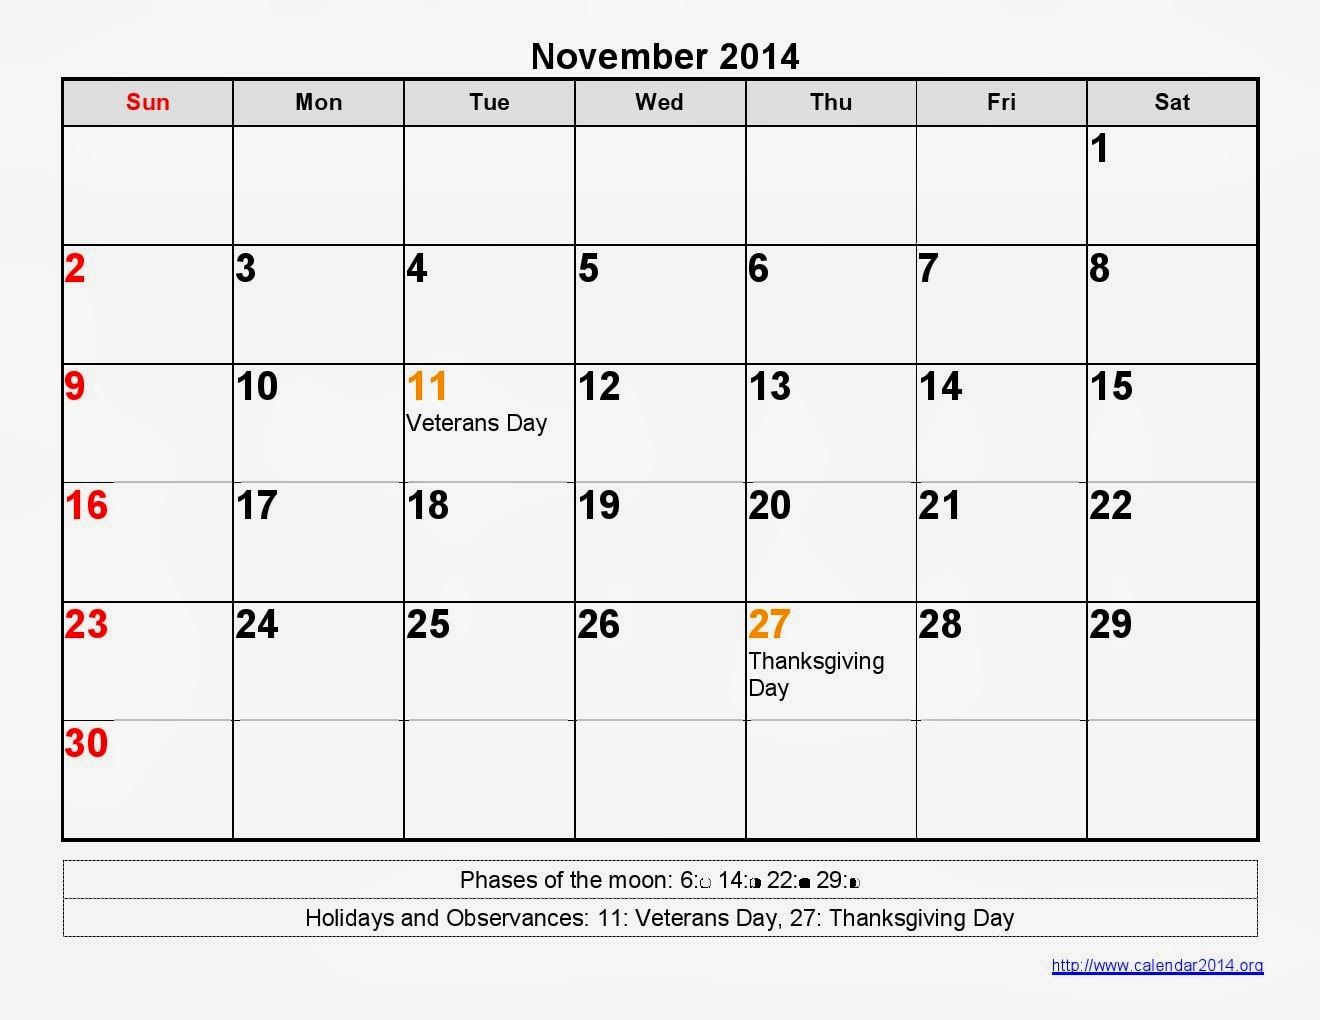 November 2014 Calendar Printable Moon Phases - Printable Calendar